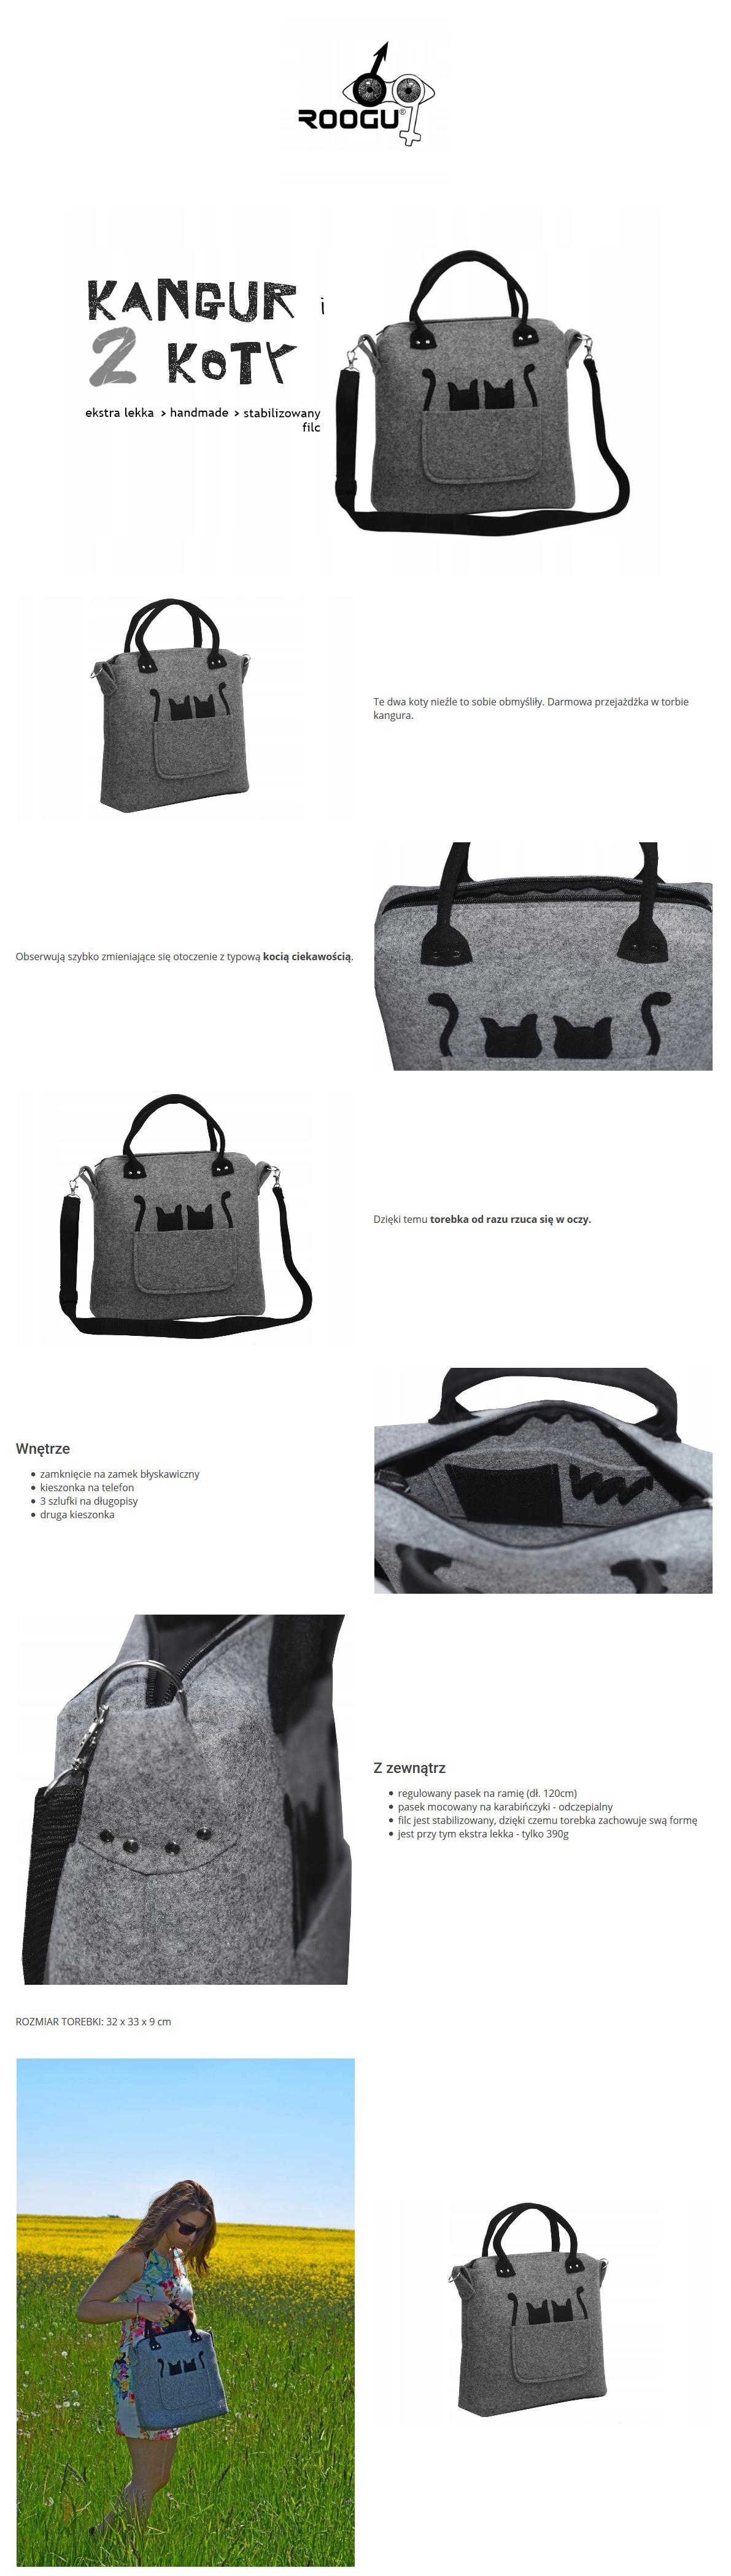 Designerska torebka na ramie do reki filc szary 2 koty